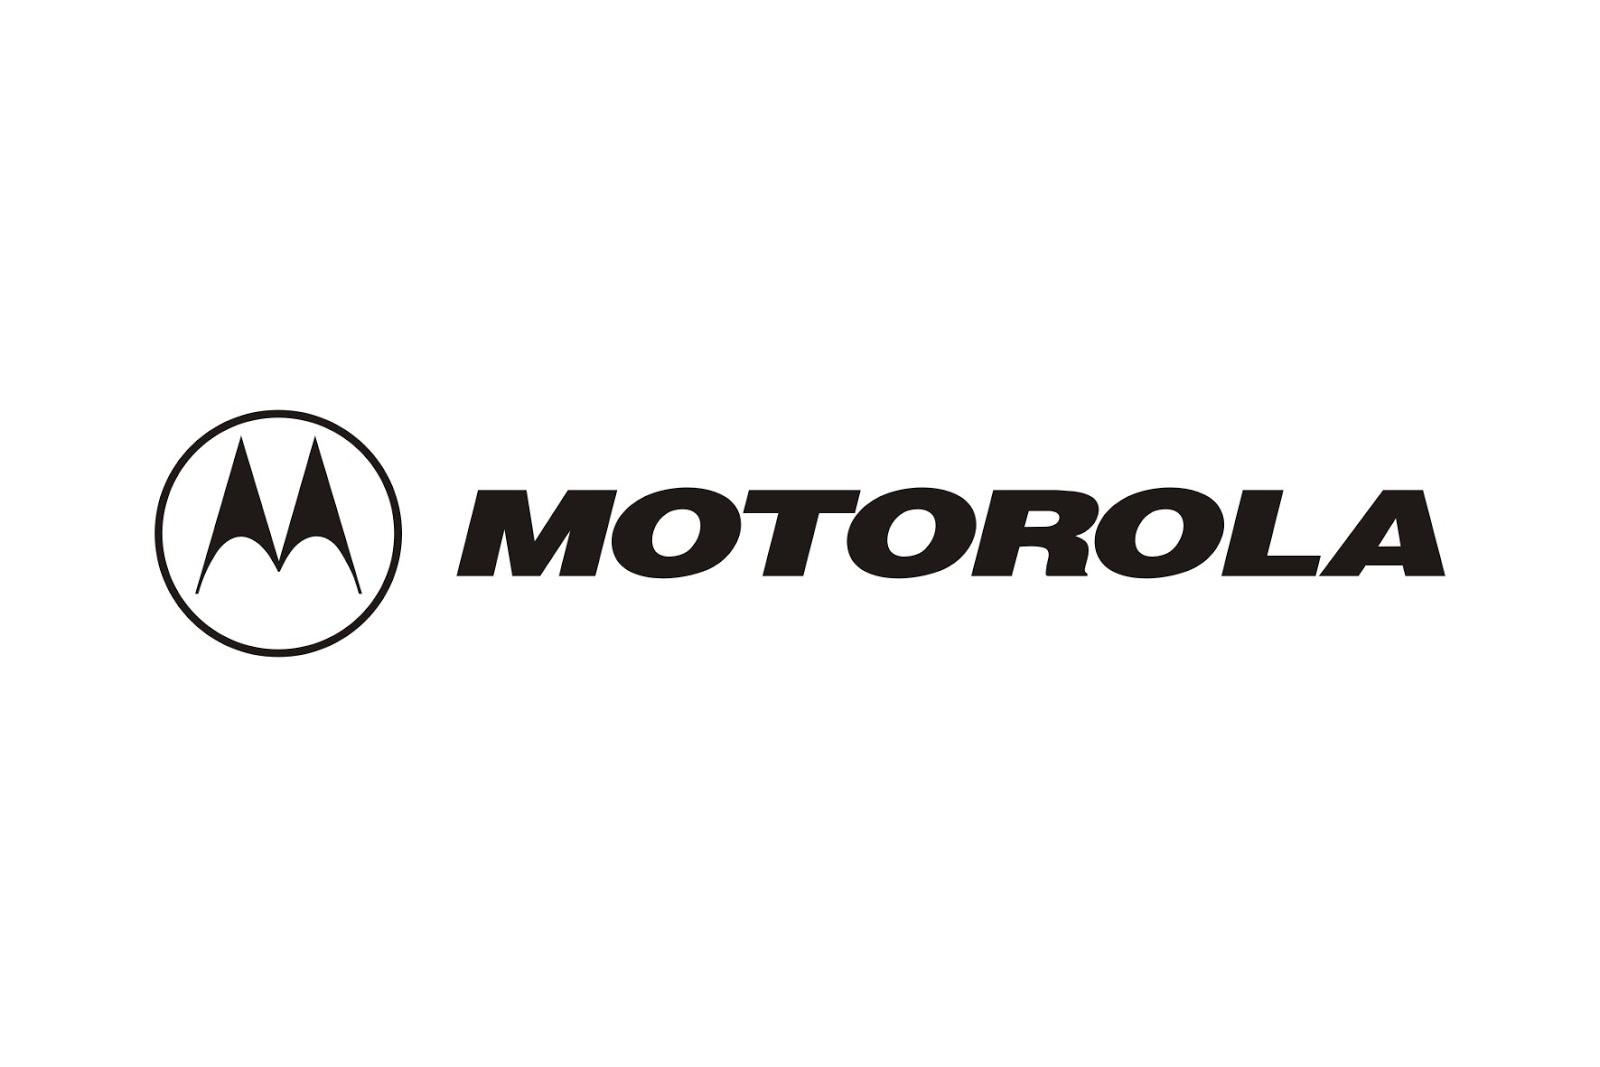 Motorola - 4 Brand Handphone Yang Pernah Berjaya Di Era Telepon Seluler